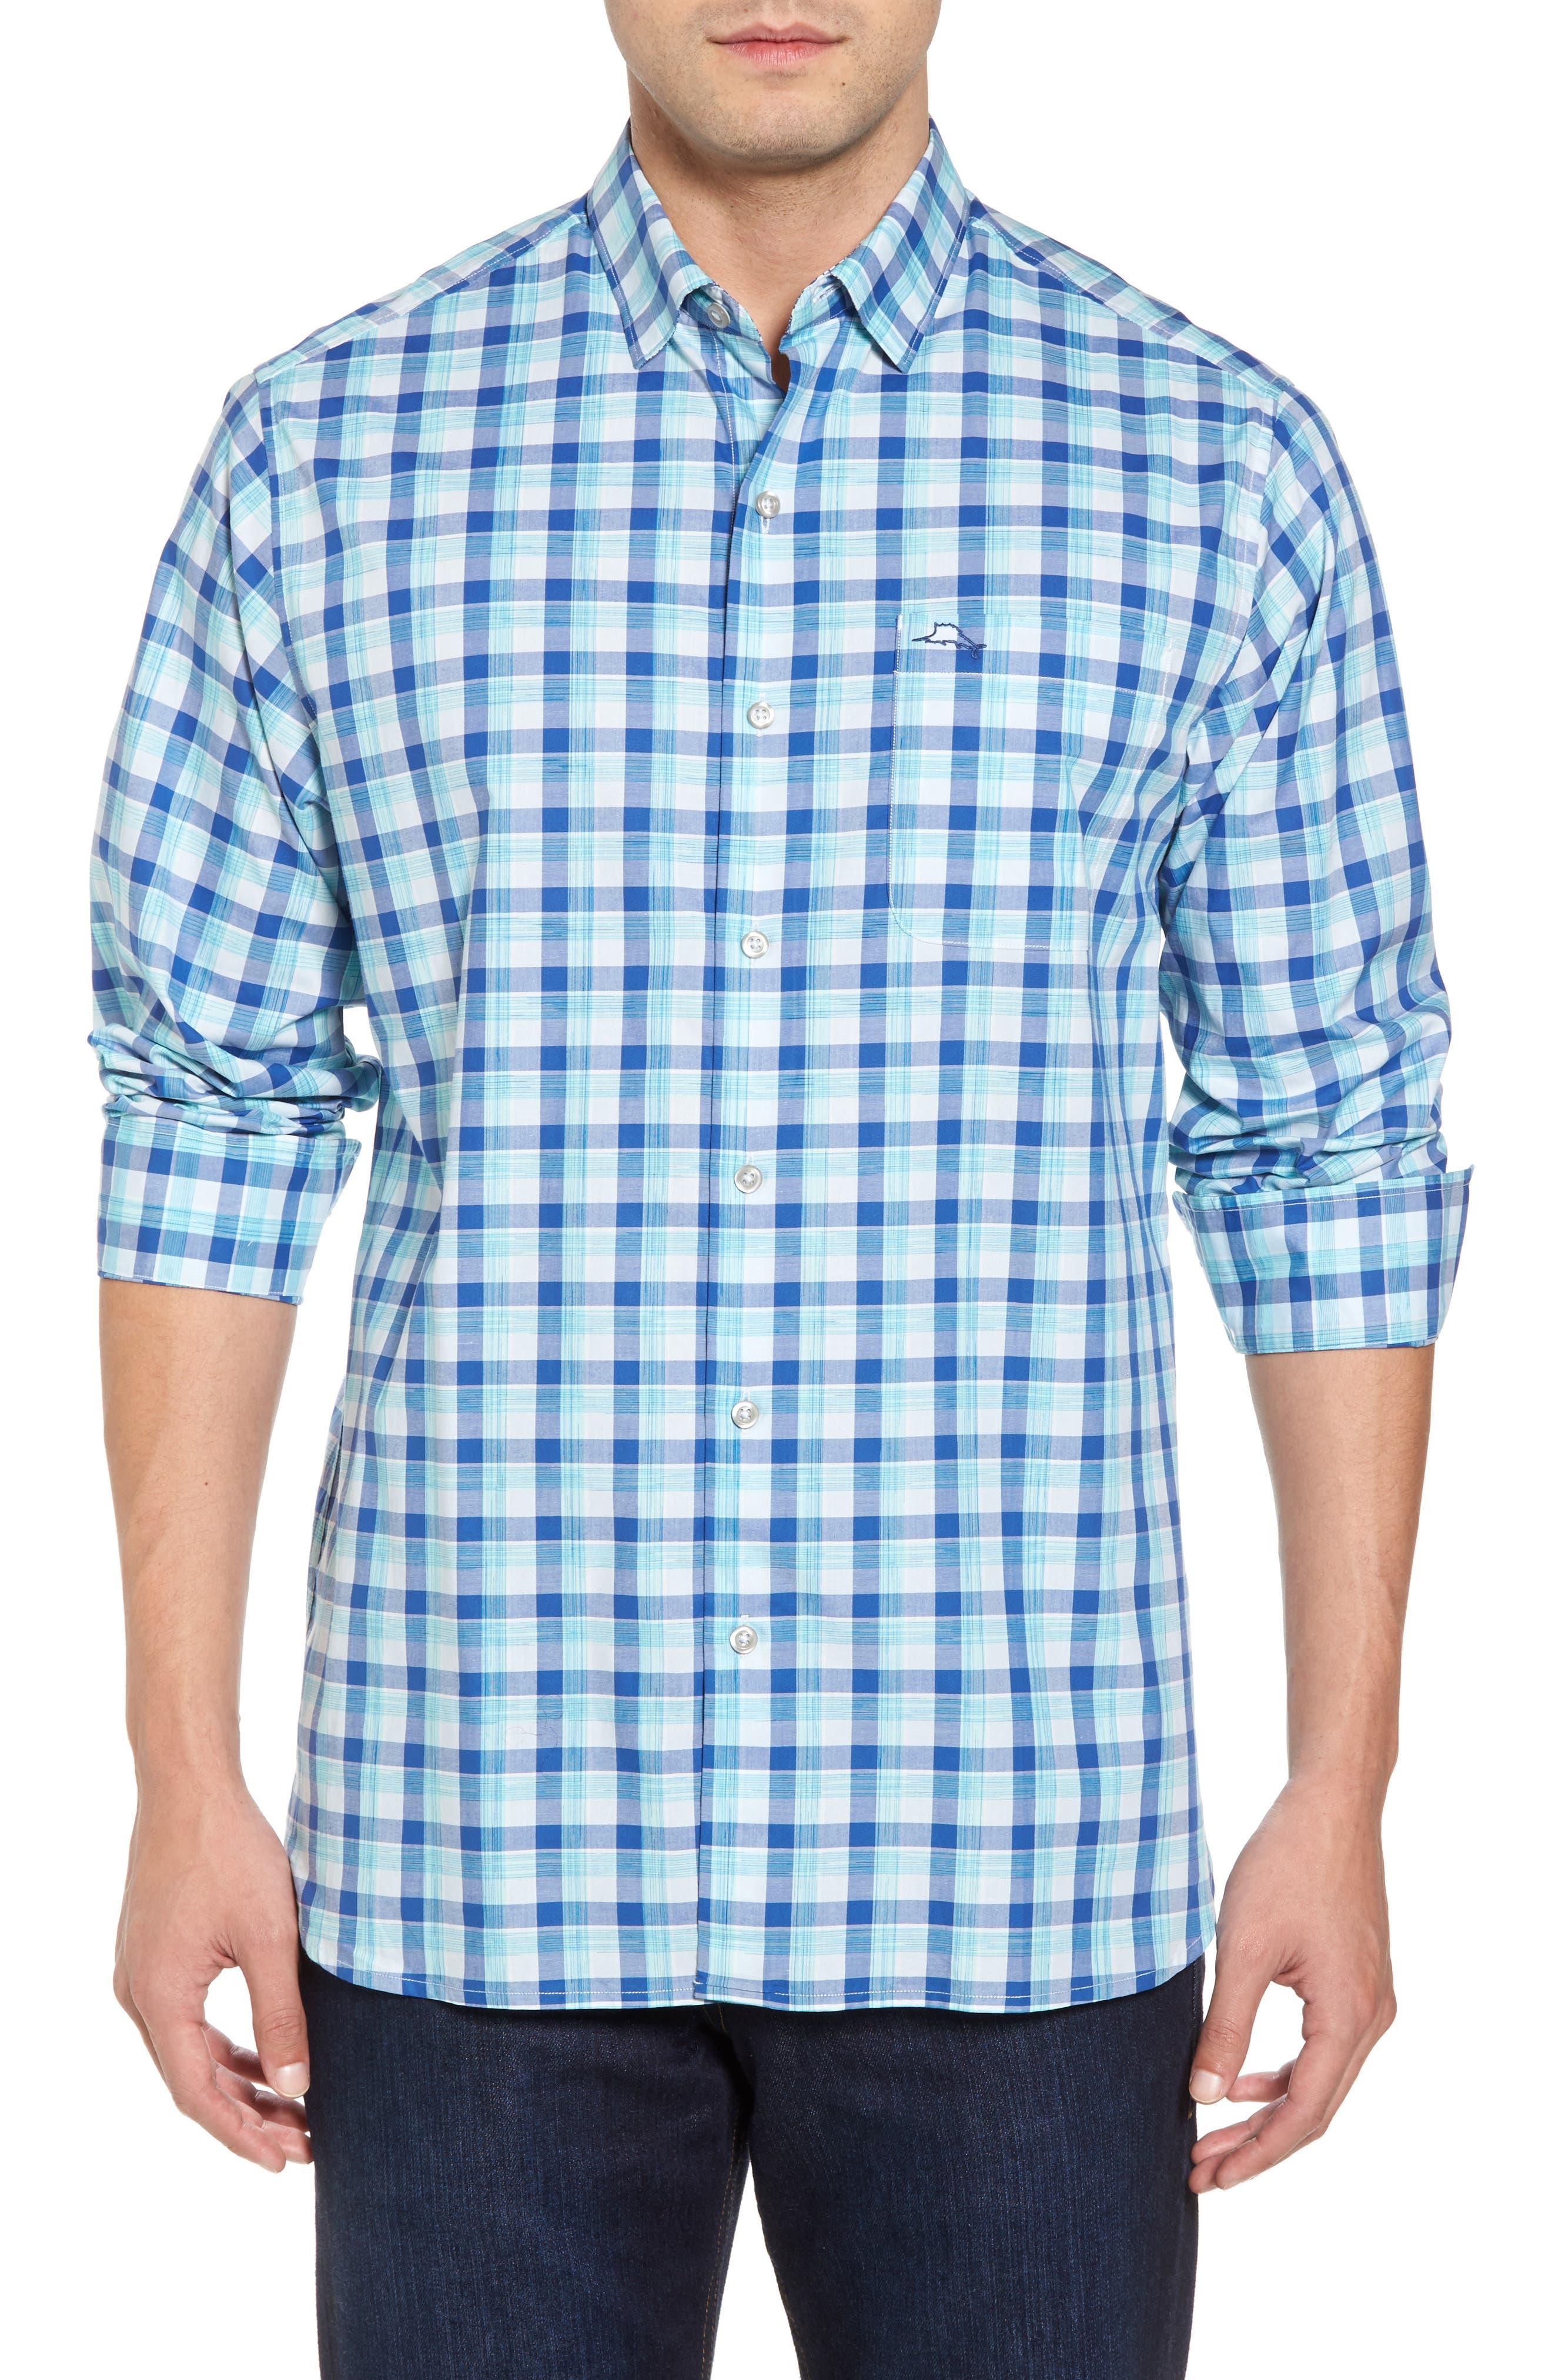 Atlantic Tides Classic Fit Plaid Sport Shirt,                         Main,                         color, Galaxy Blue